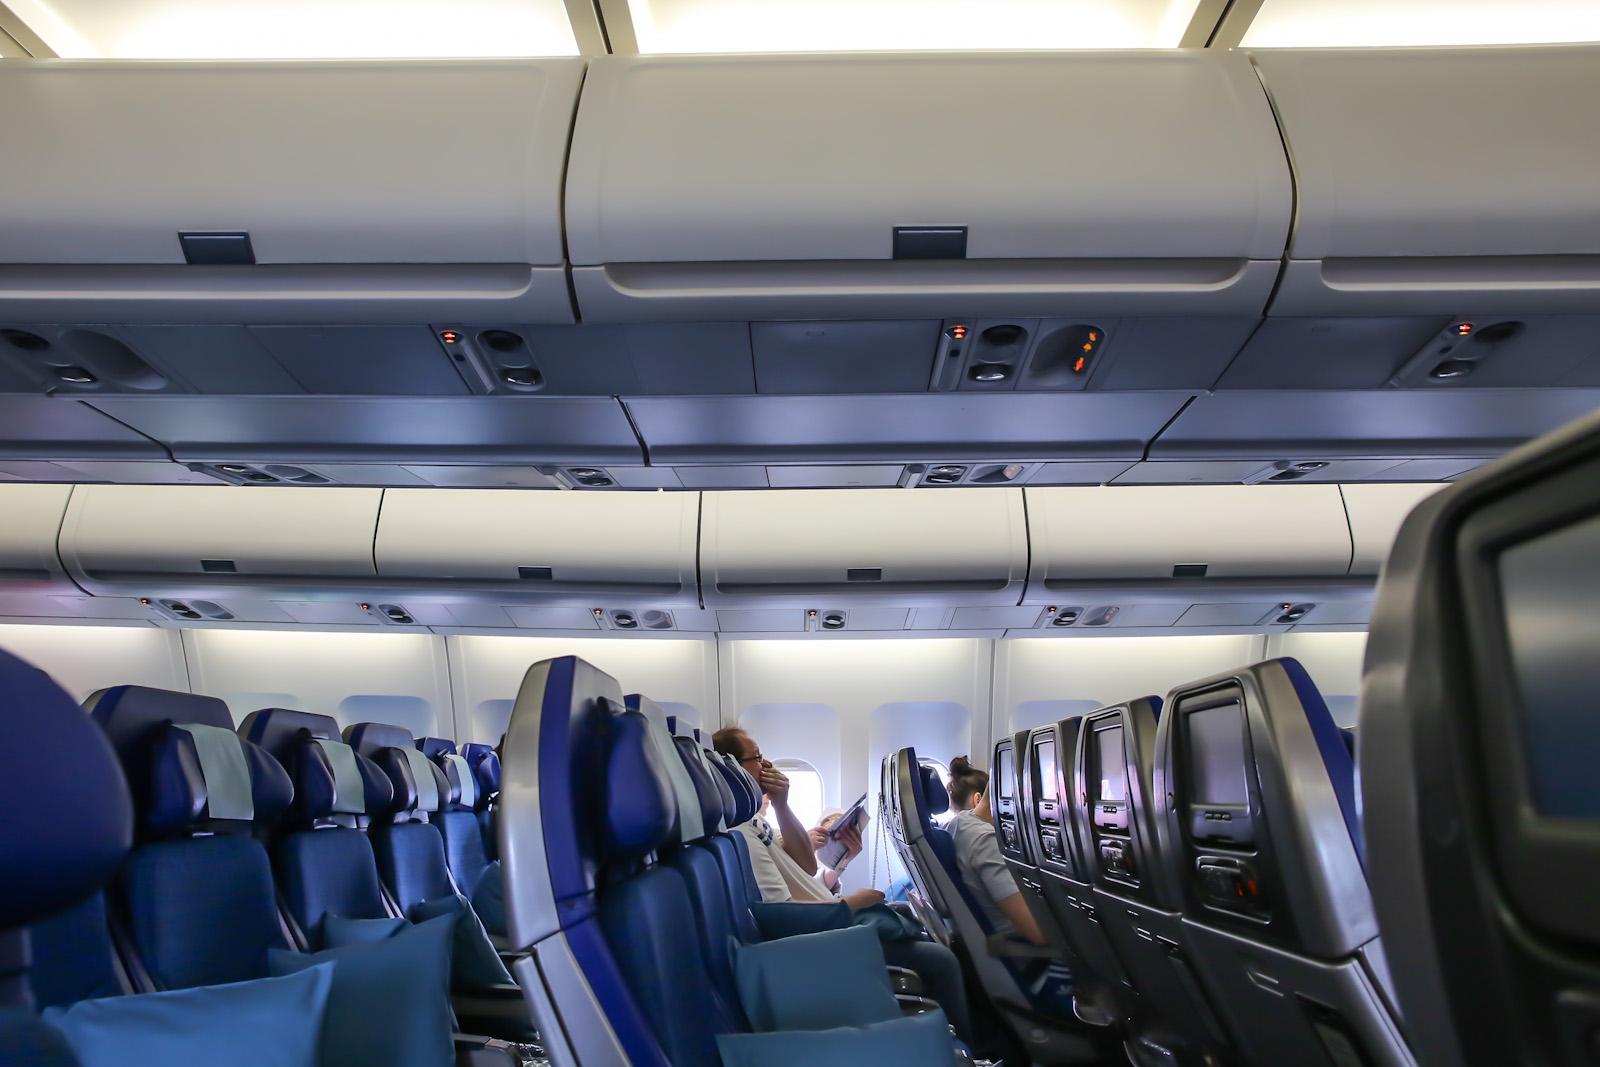 Салон экономического класса в самолете Airbus A340-300 авиакомпании Cathay Pacific